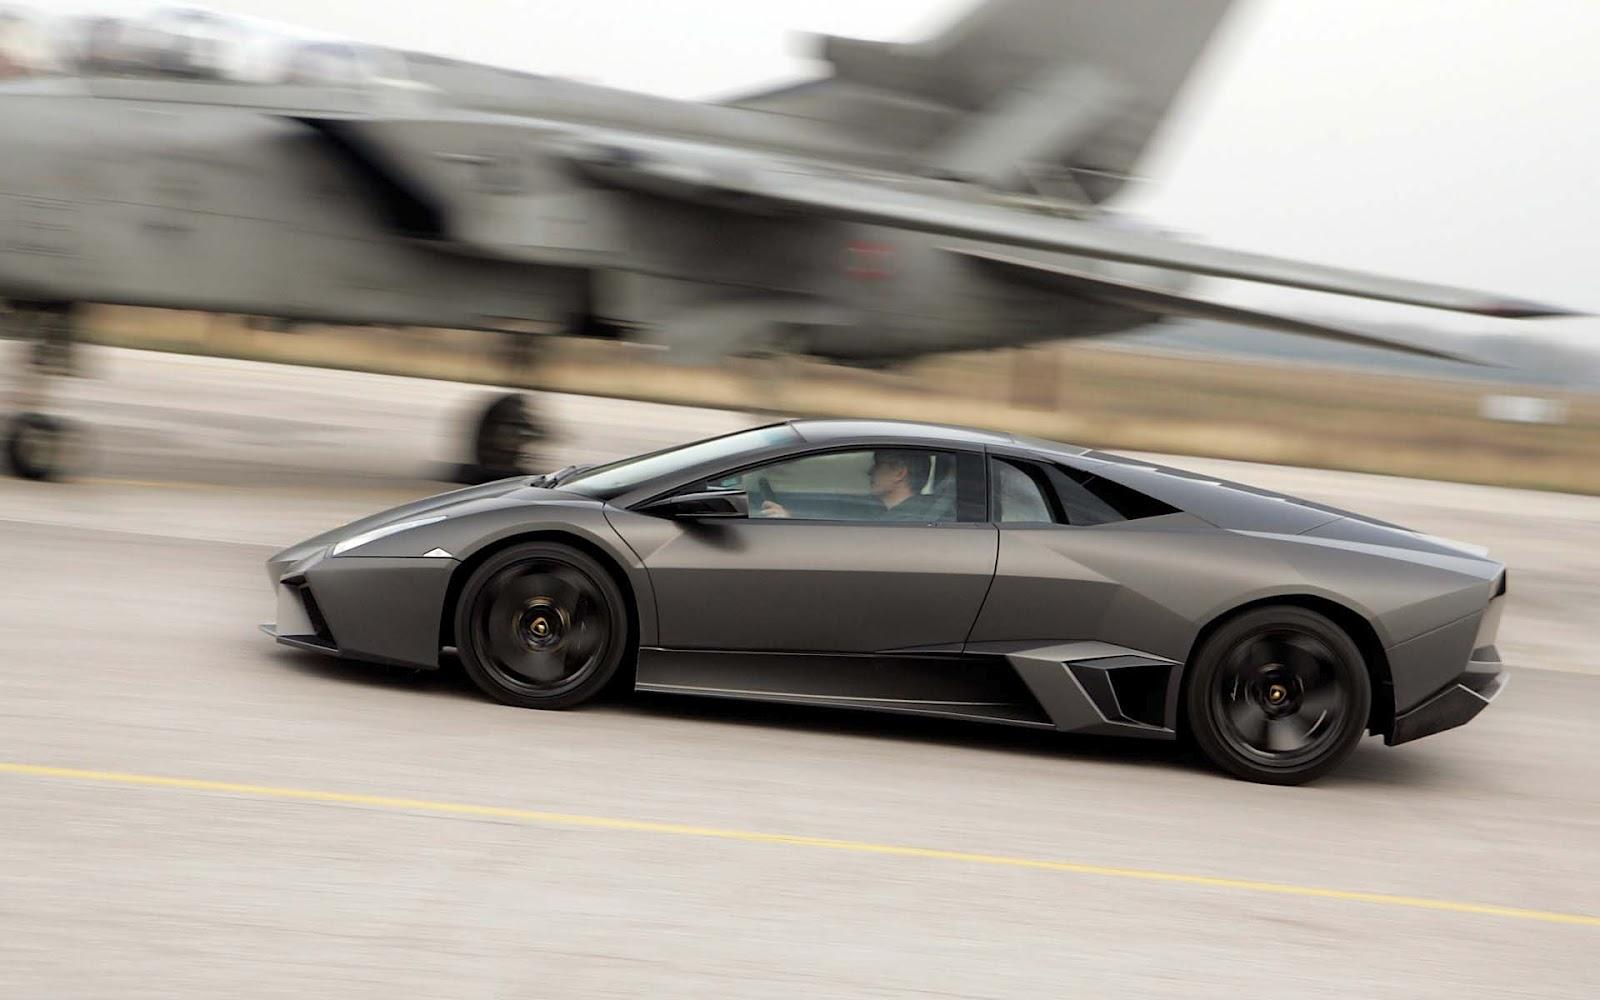 http://3.bp.blogspot.com/-k3WZaCBj1q4/UFBjxo38JDI/AAAAAAAADEU/7i1YT-kwZvg/s1600/Lamborghini_Reventon_004.jpg